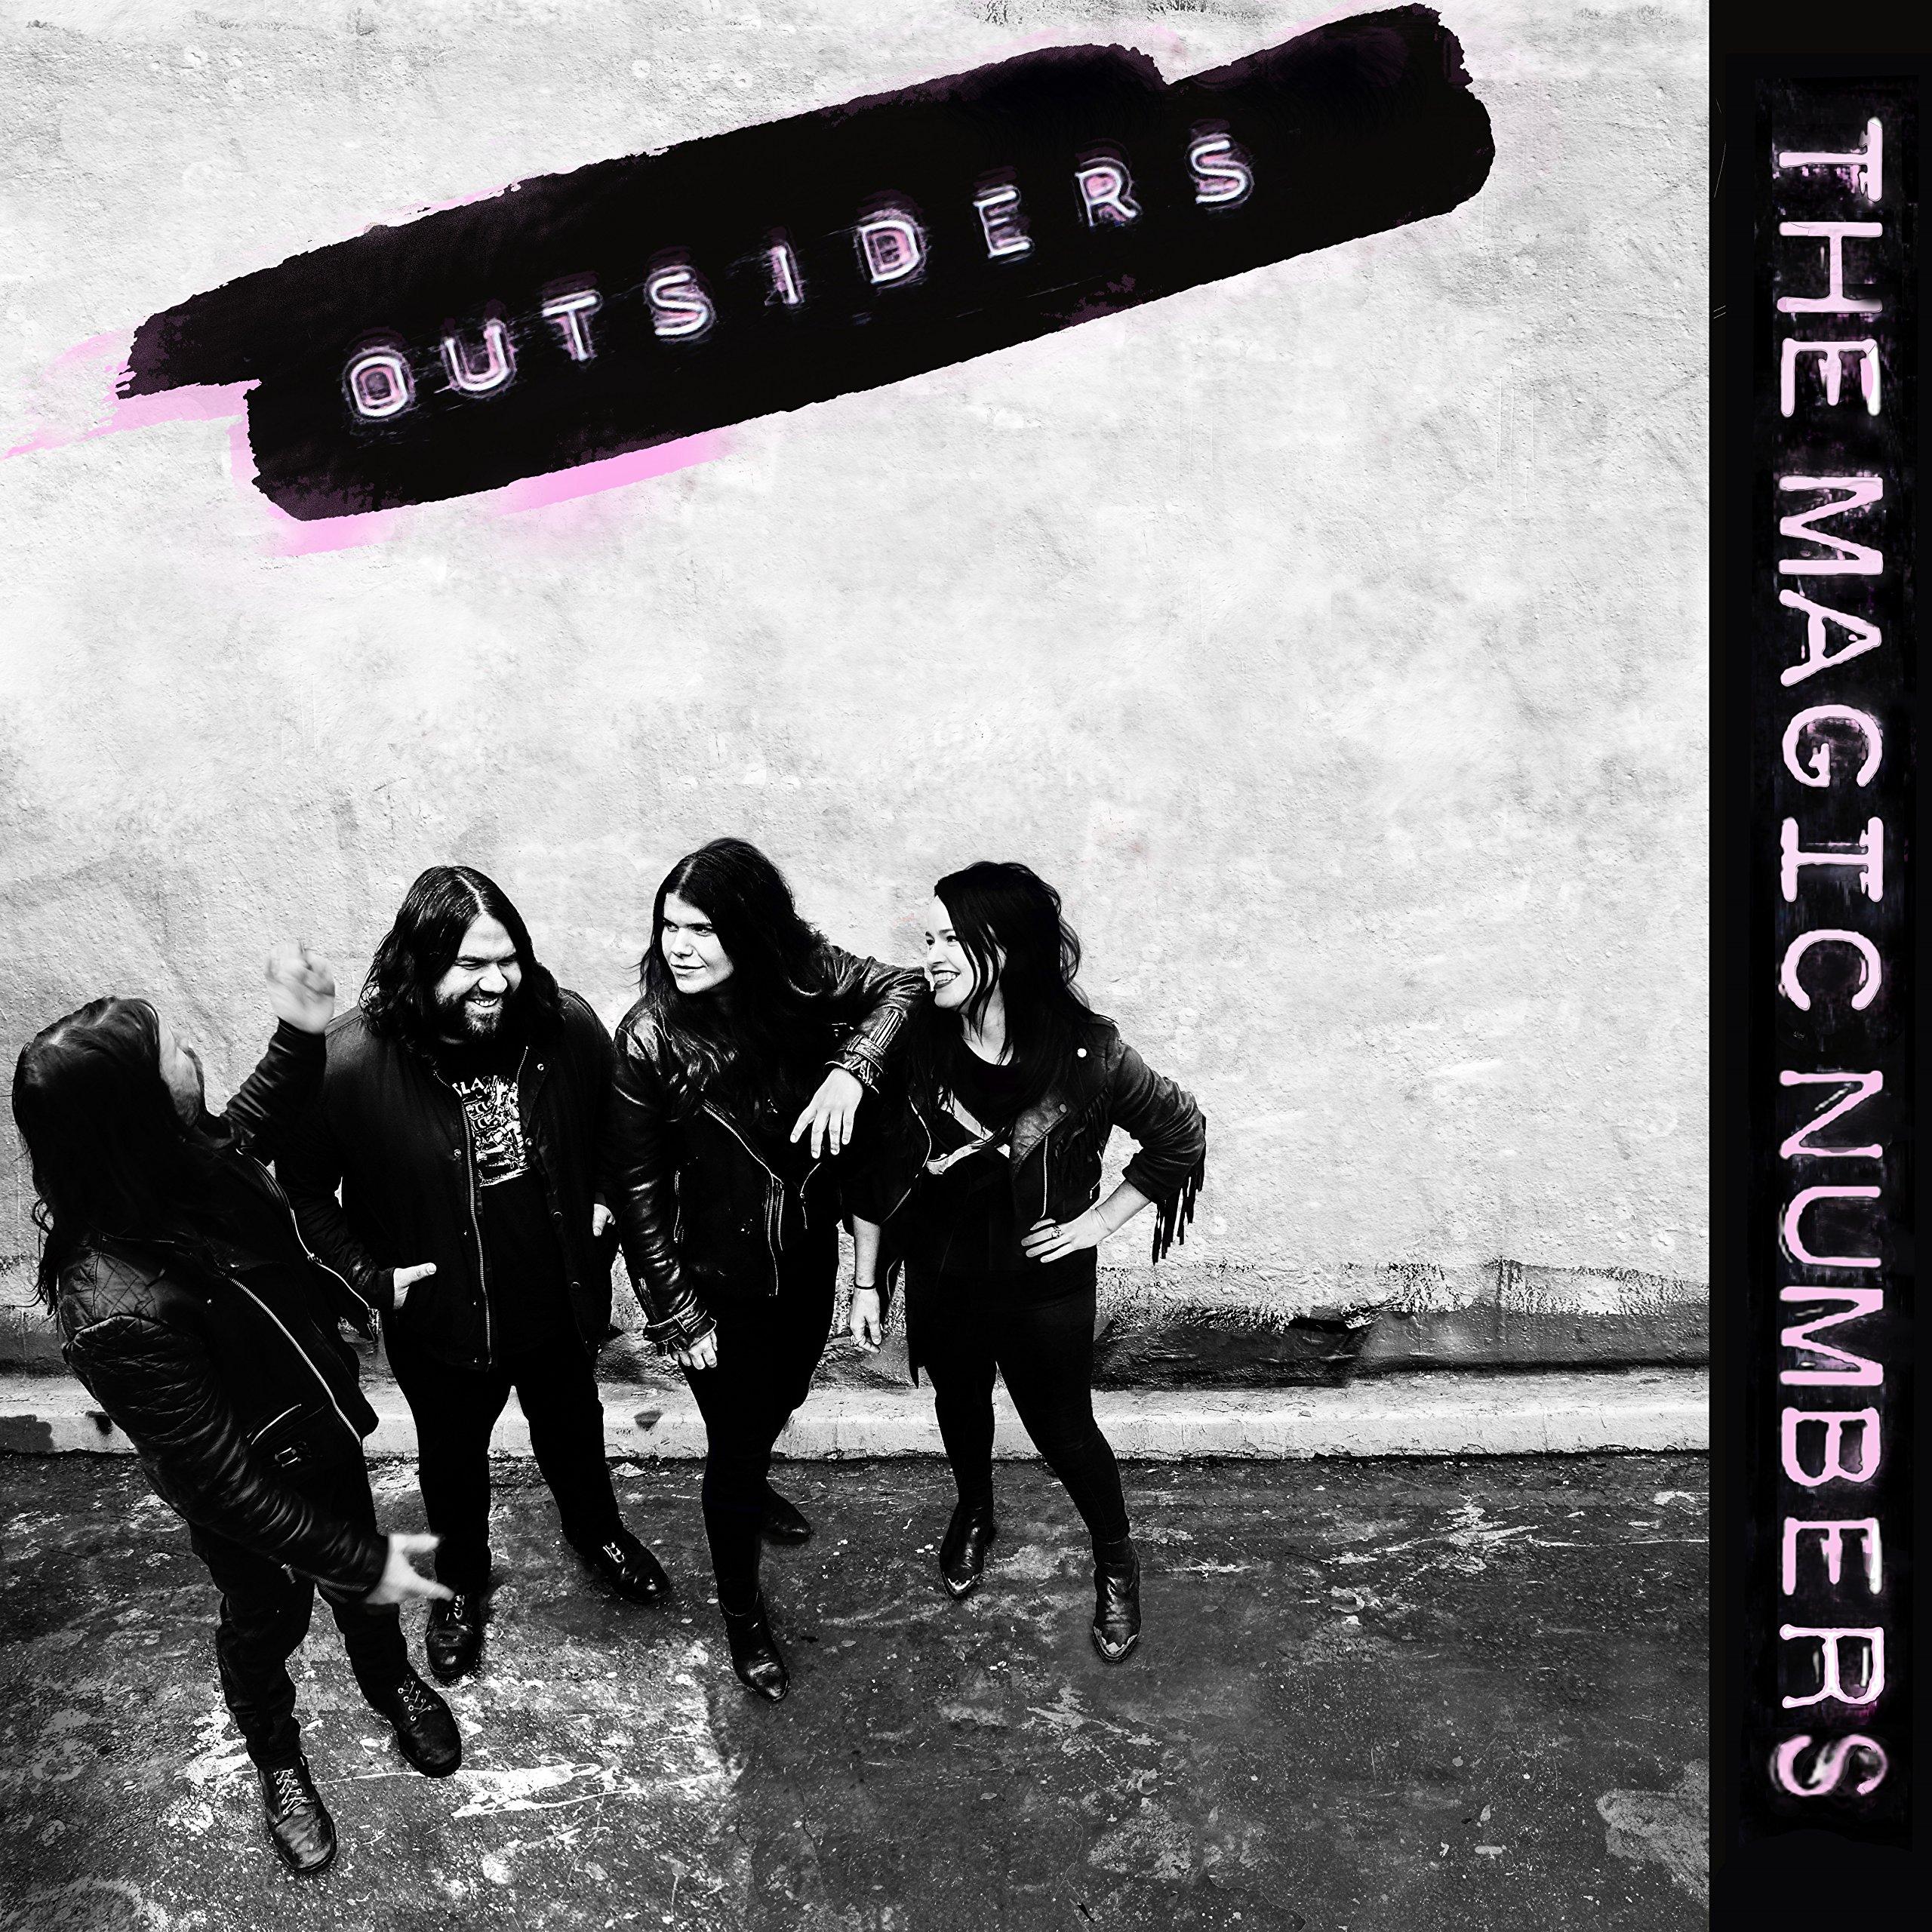 Vinilo : The Magic Numbers - Outsiders (LP Vinyl)